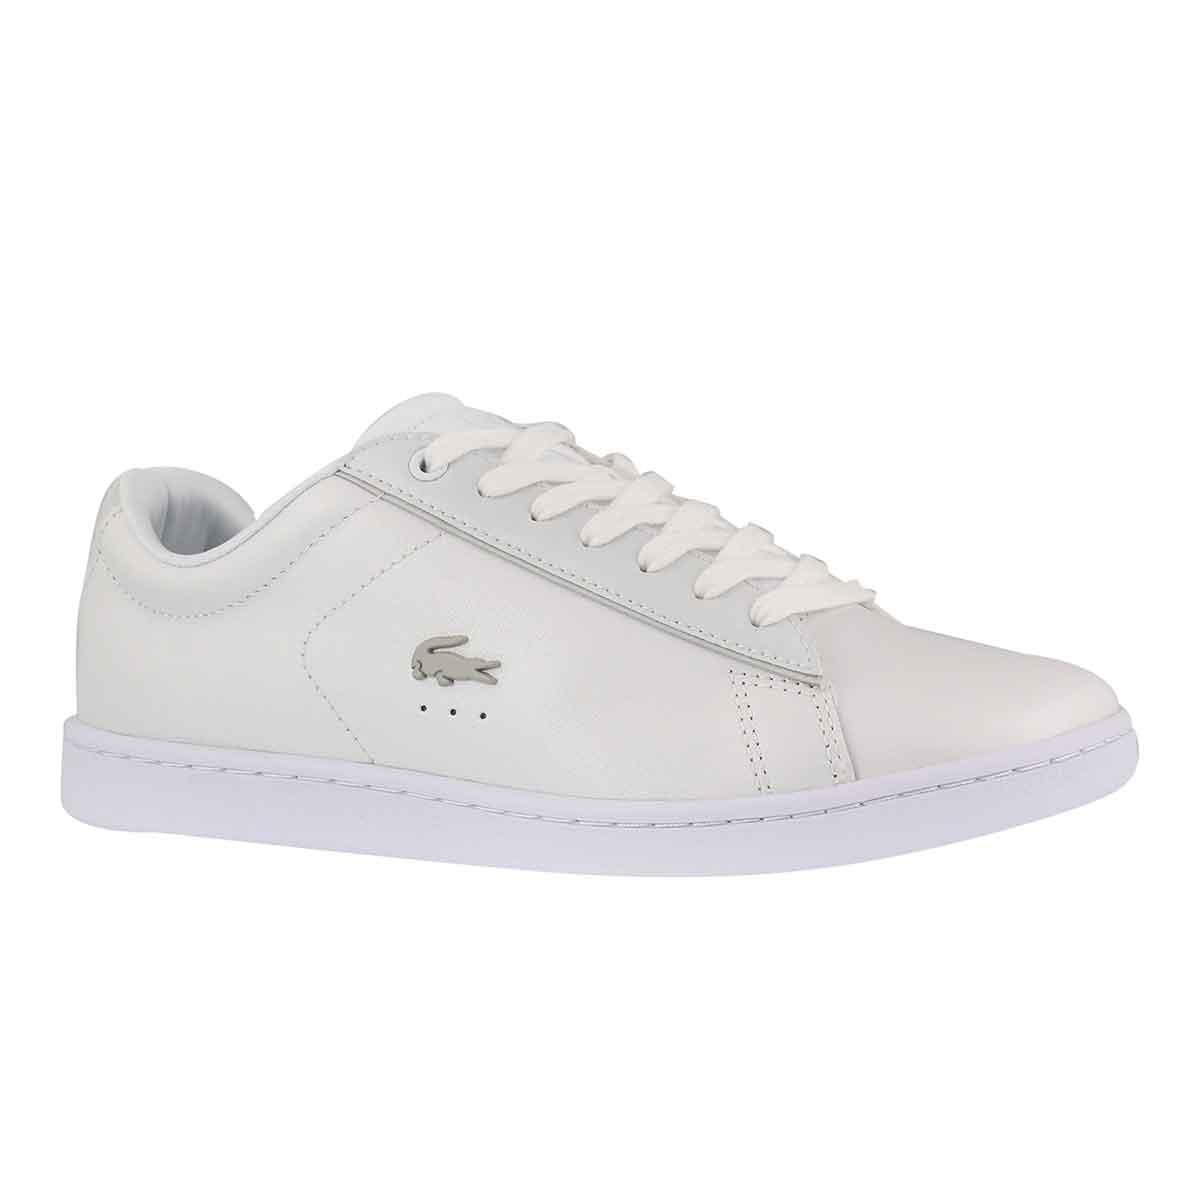 Women's CARNABY EVO 118 1 white/light grey sneaker